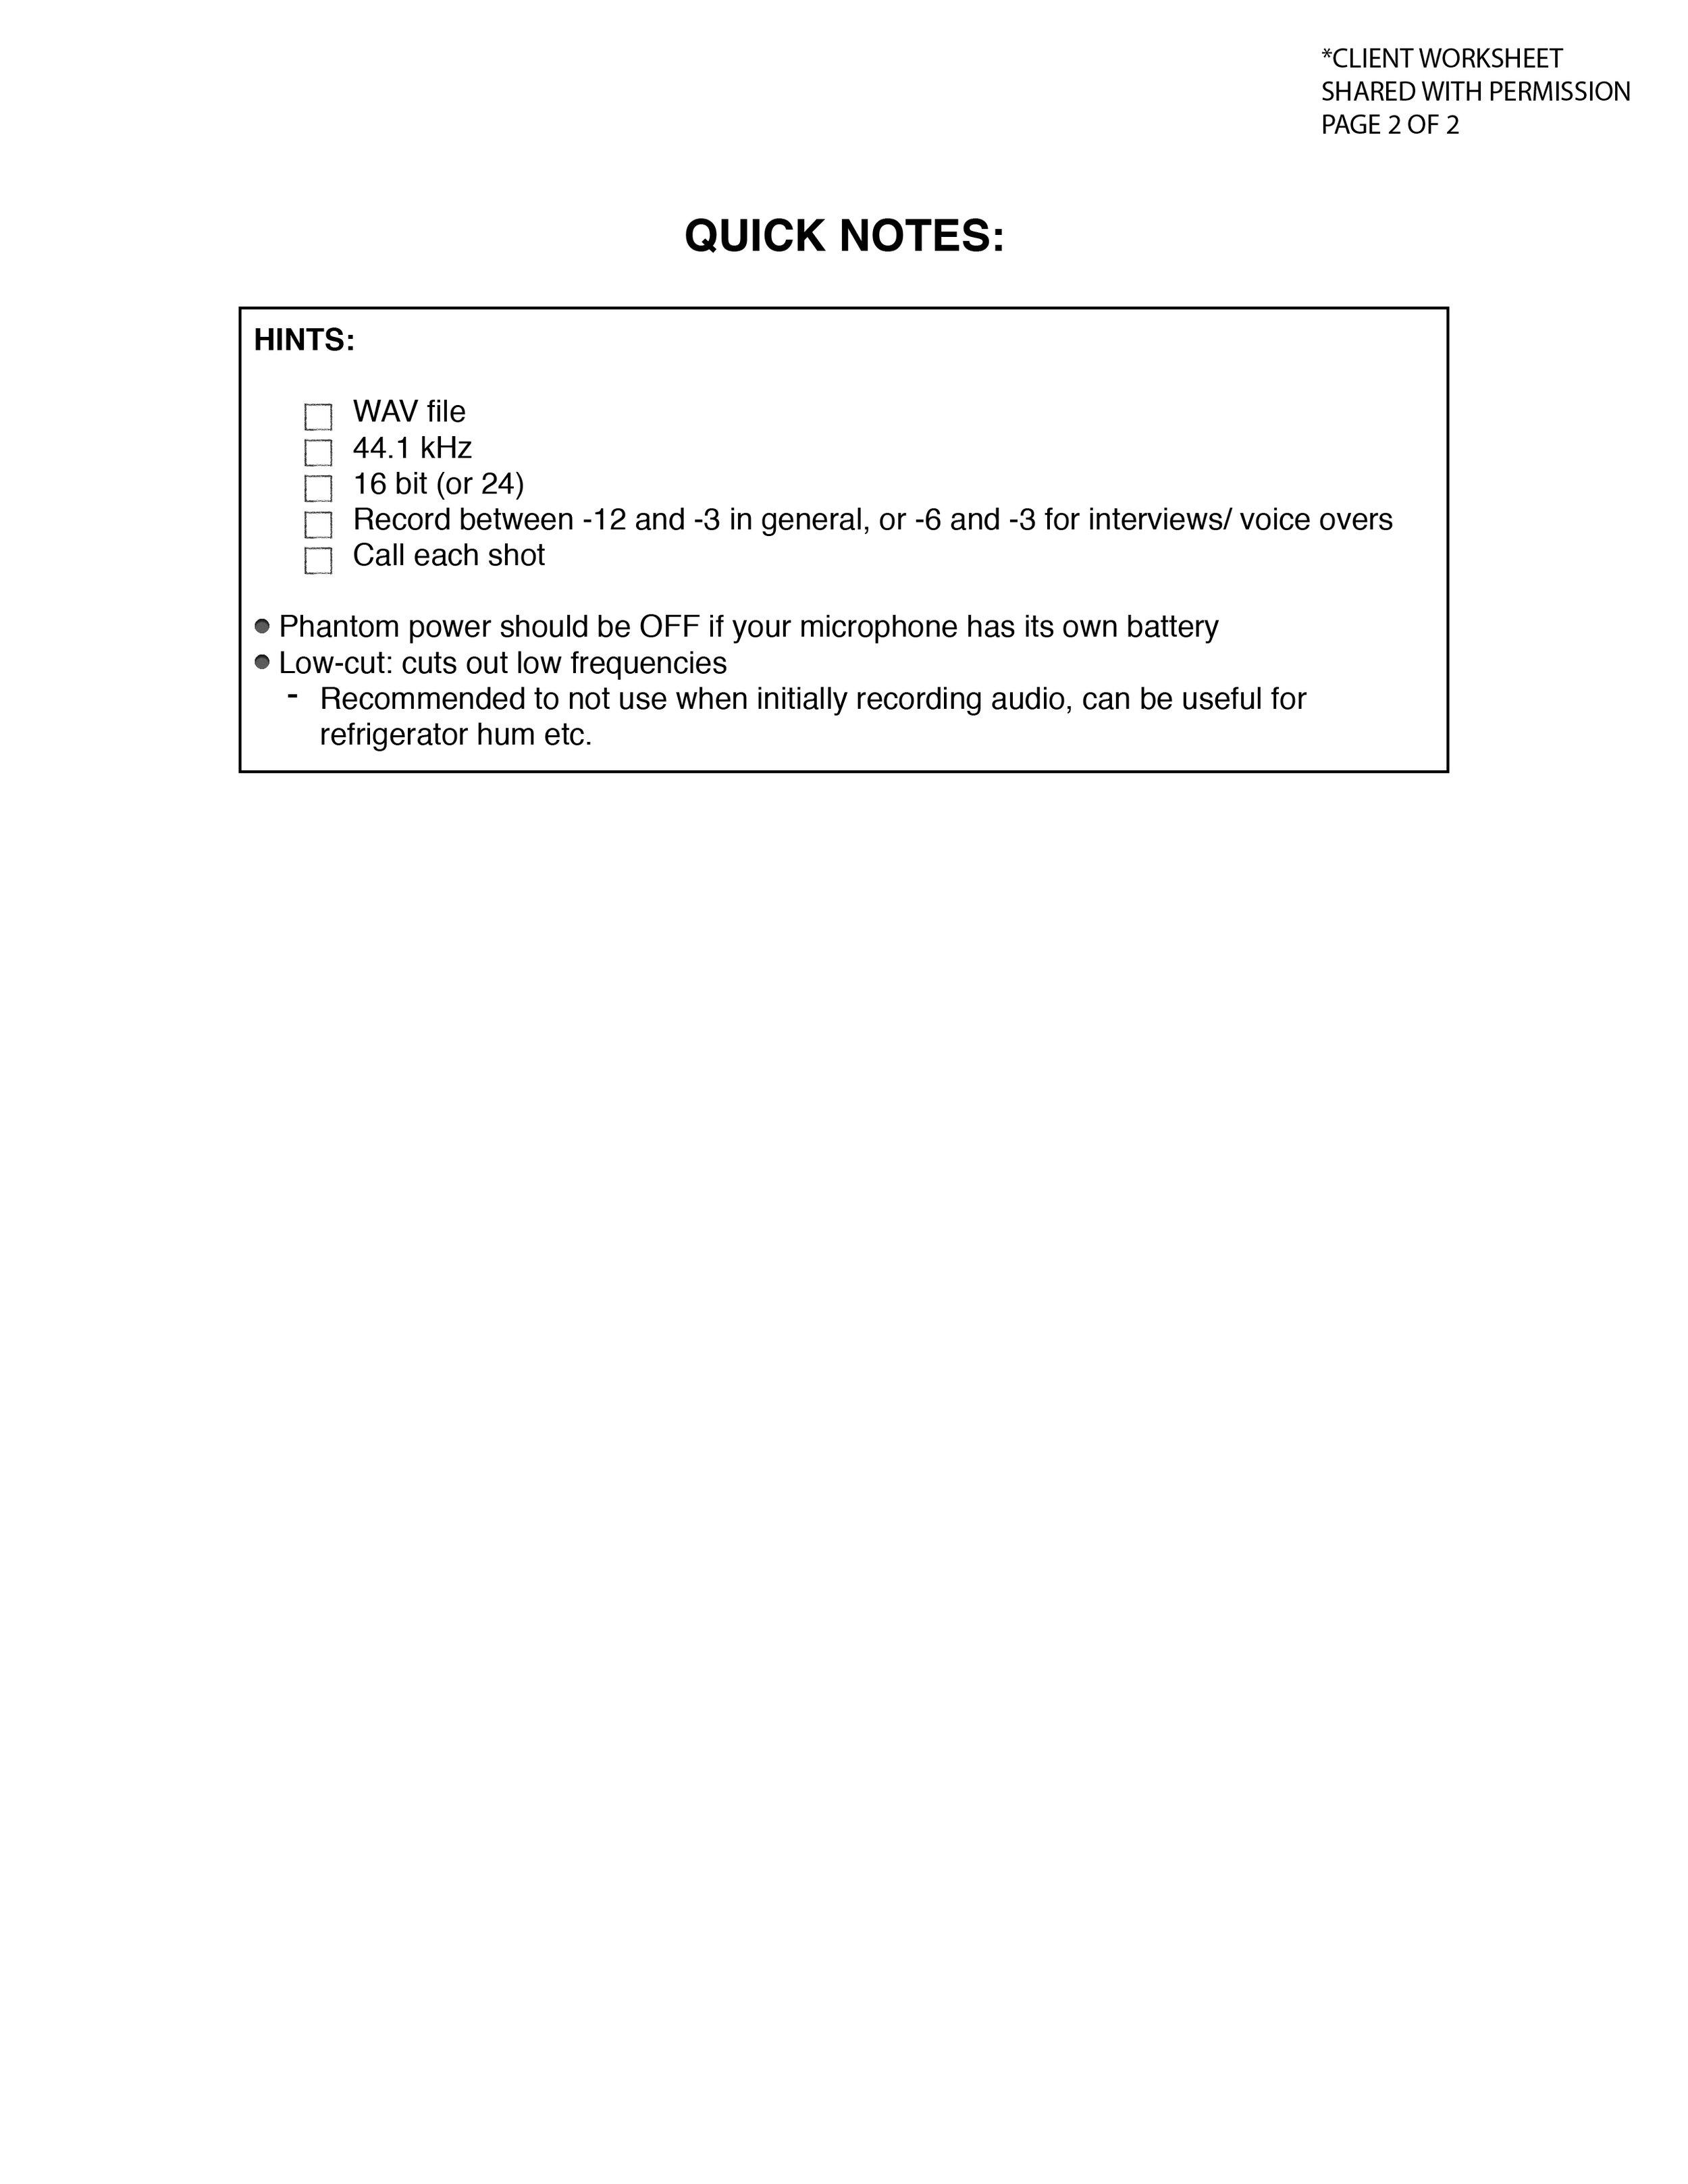 Recording_Audio_General_Cheat_Sheet2.jpg